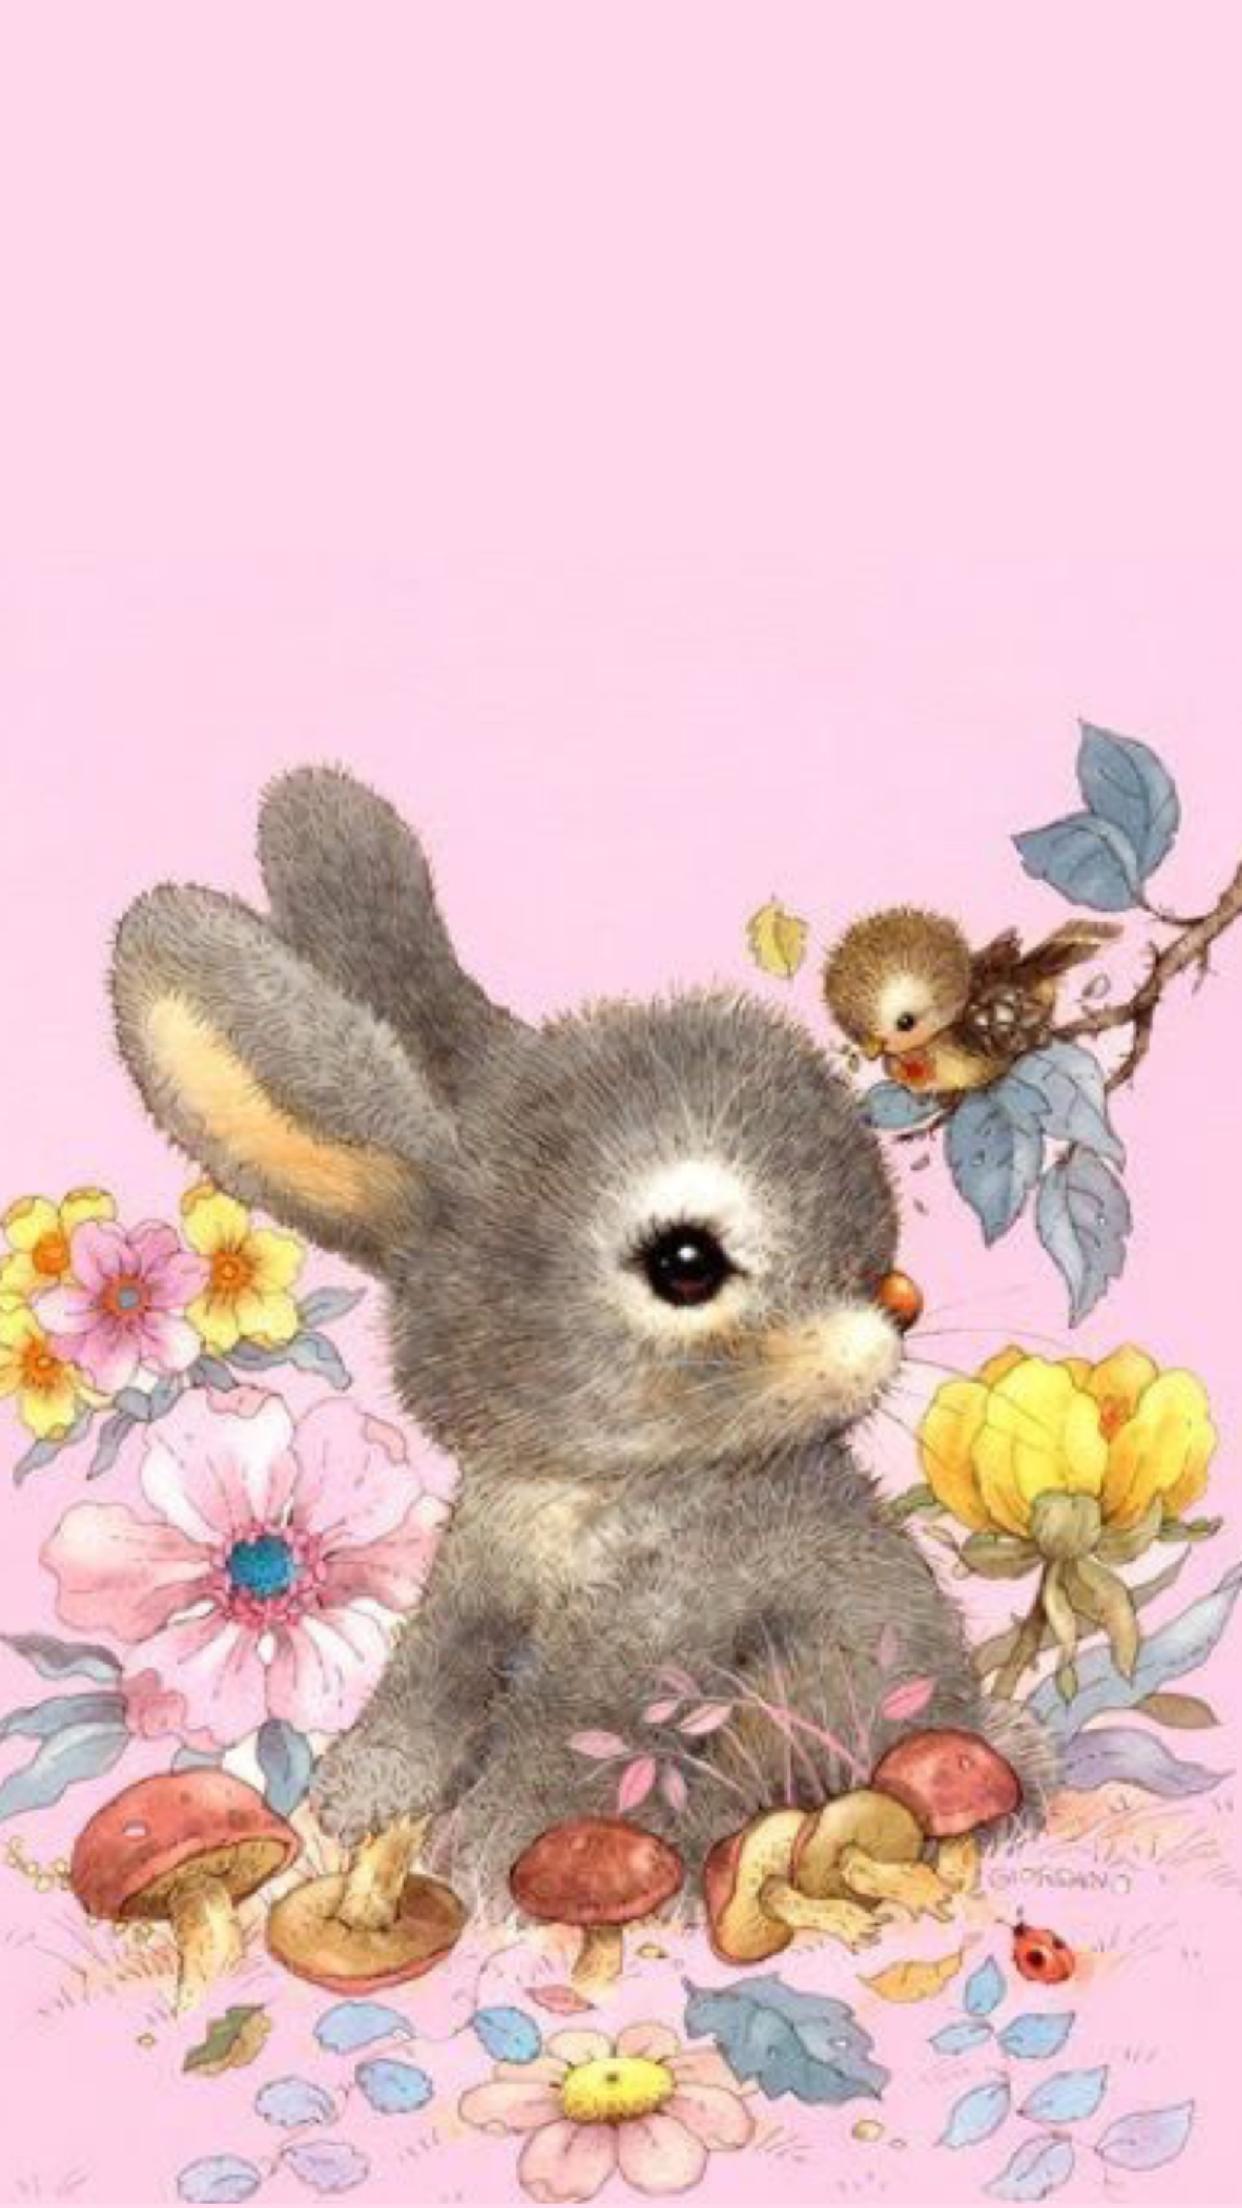 Pin By Cecelia Sirene On Wallpapers Bear Wallpaper Teddy Bear Wallpaper Rabbit Wallpaper